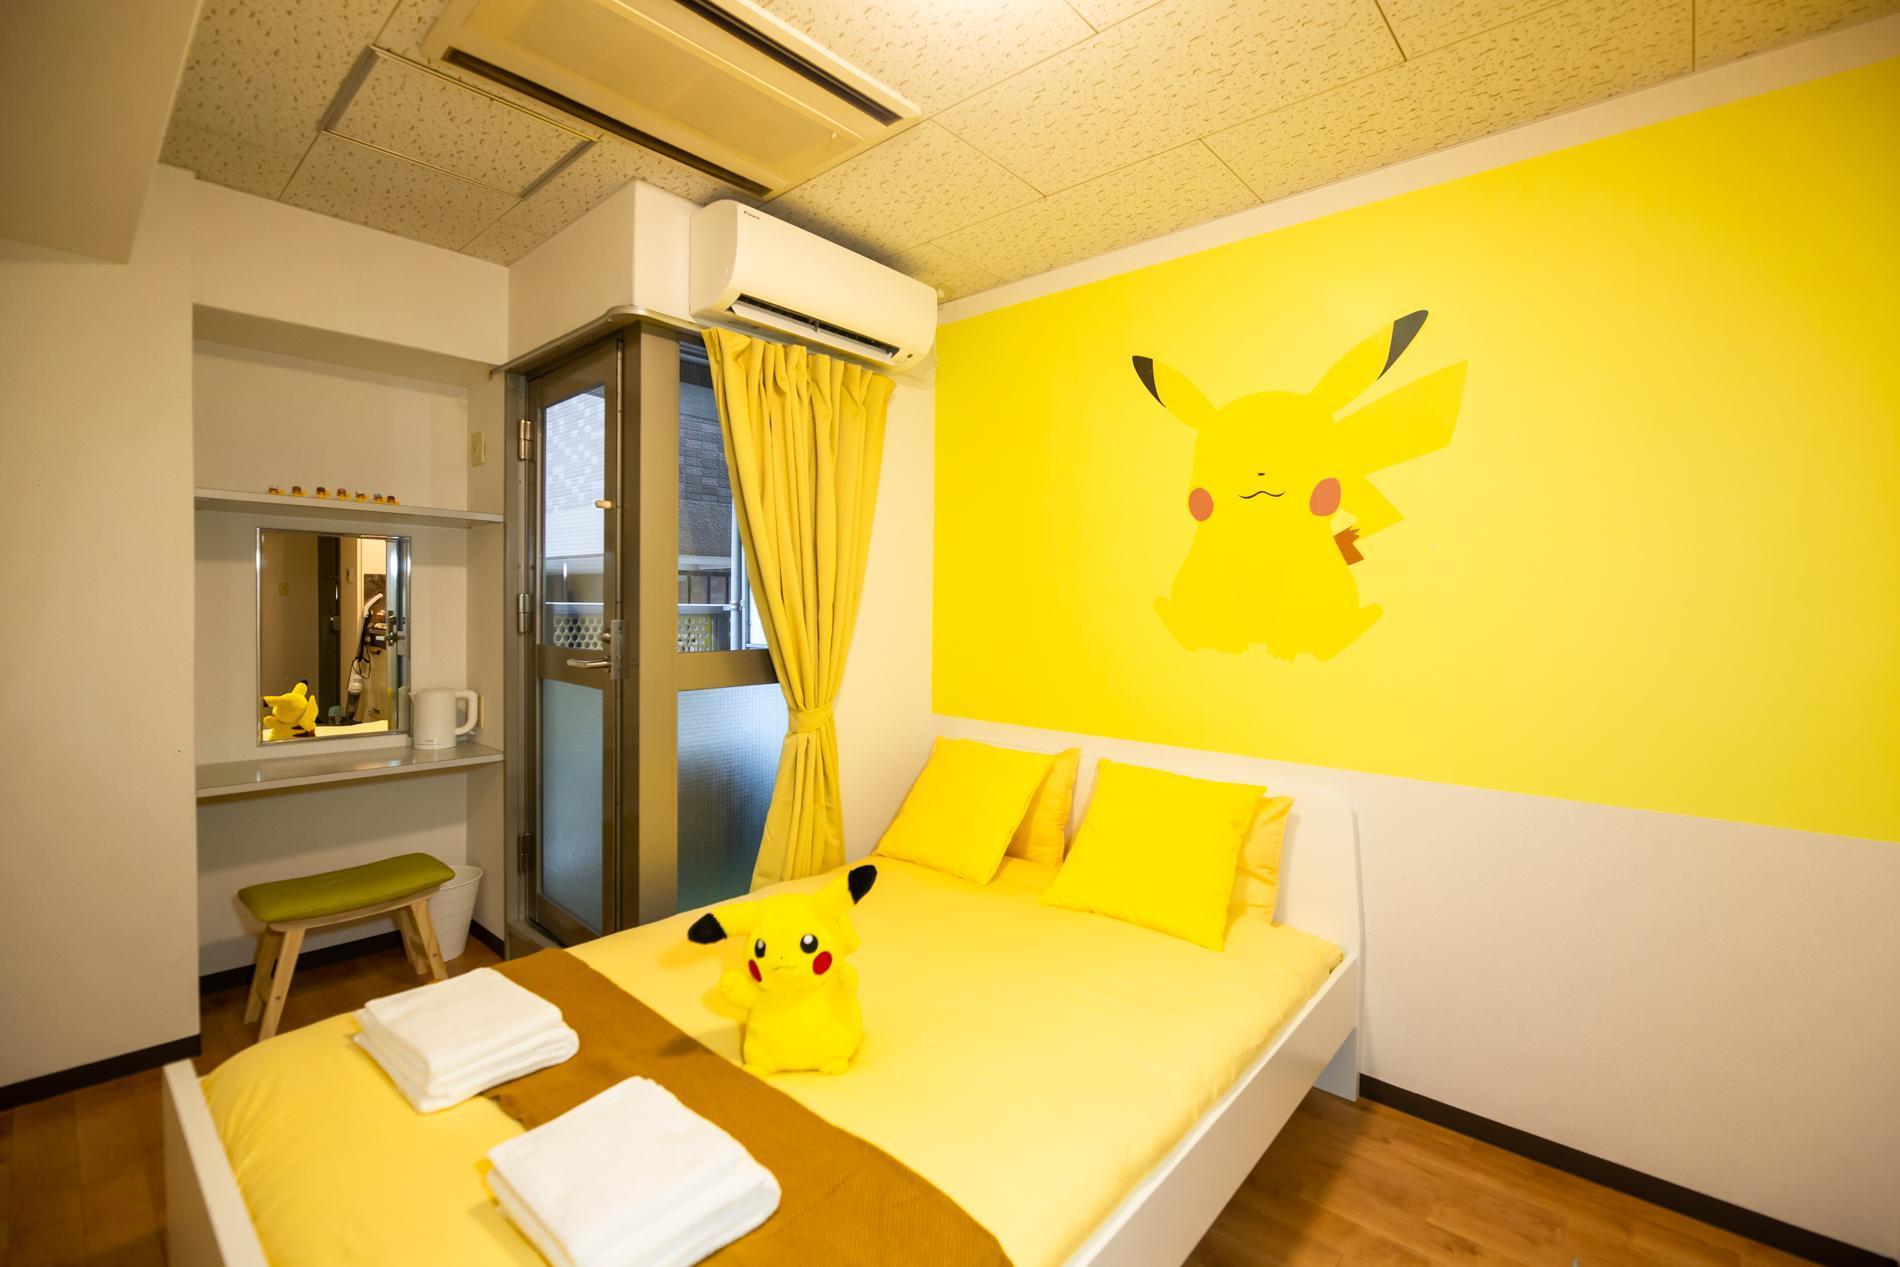 Pikachu Fan Art Den Den Anime Namba Osaka PA02 401